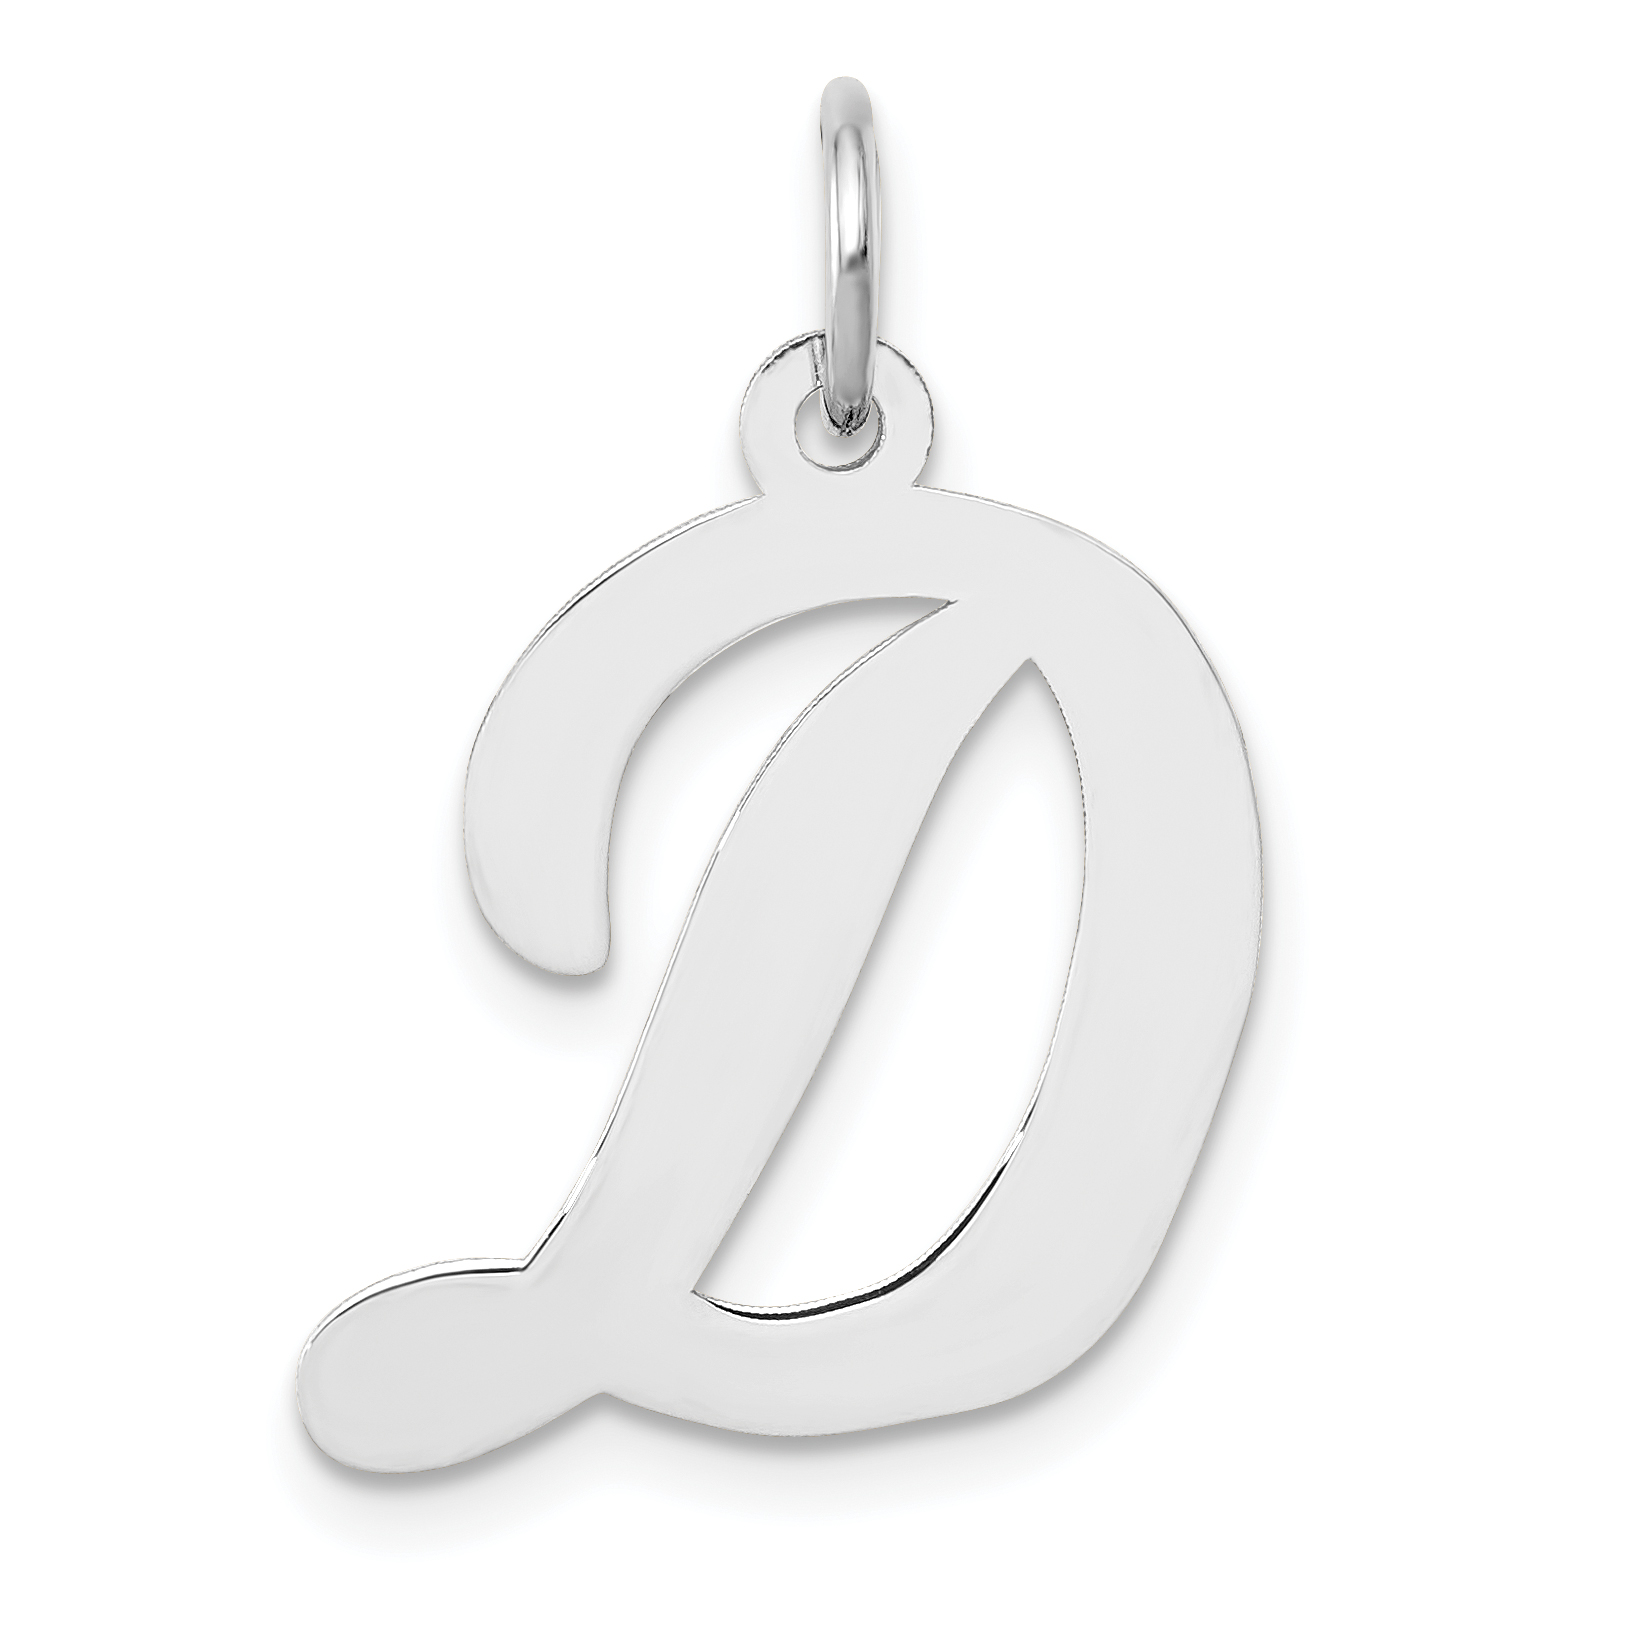 14K White Gold Polished Script Initial Letter D Charm Pendant